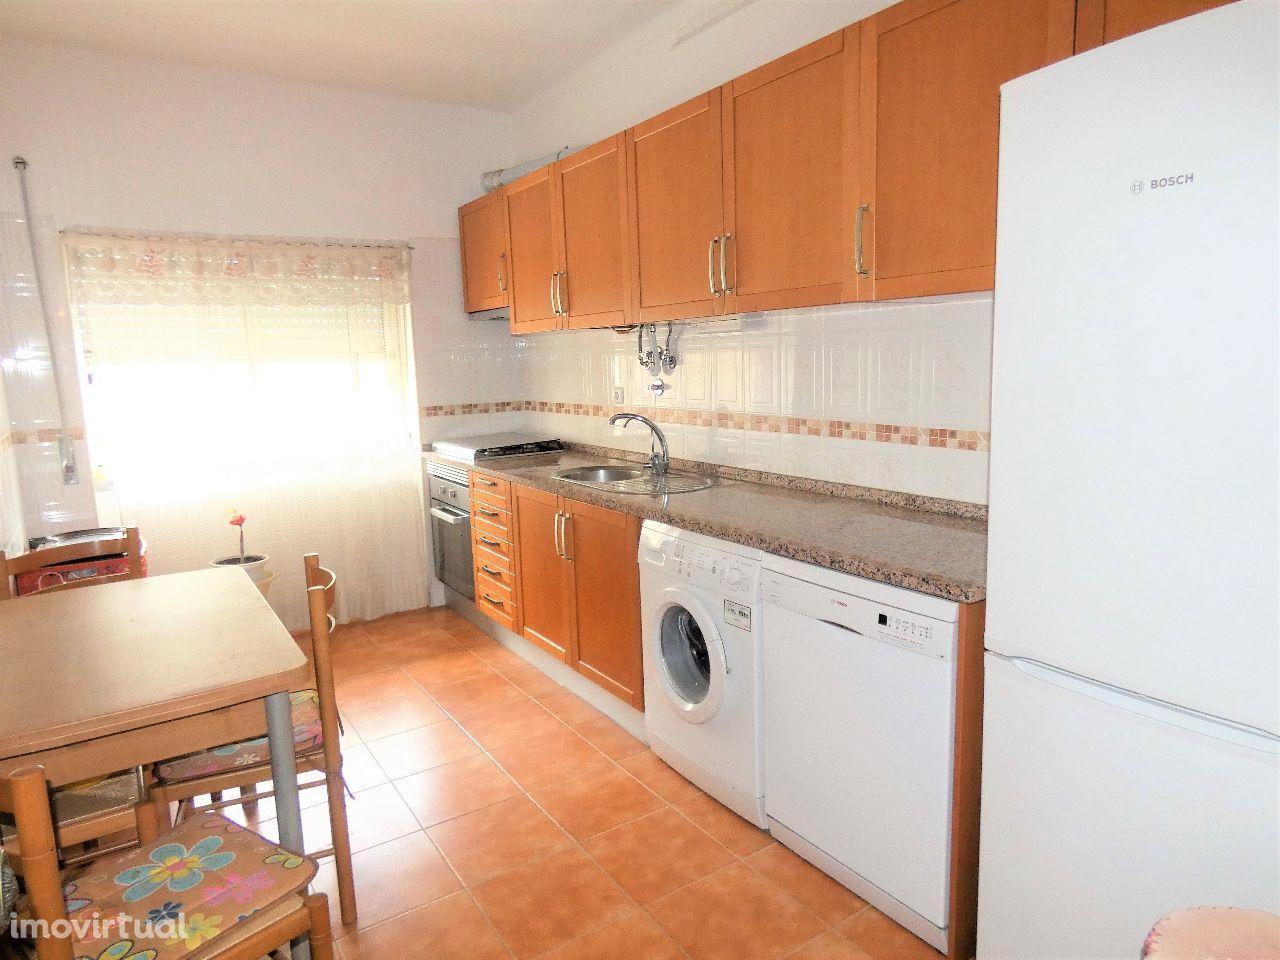 LARANJEIRO - T2, LINHA METRO, cozinha remodelada e equipada!